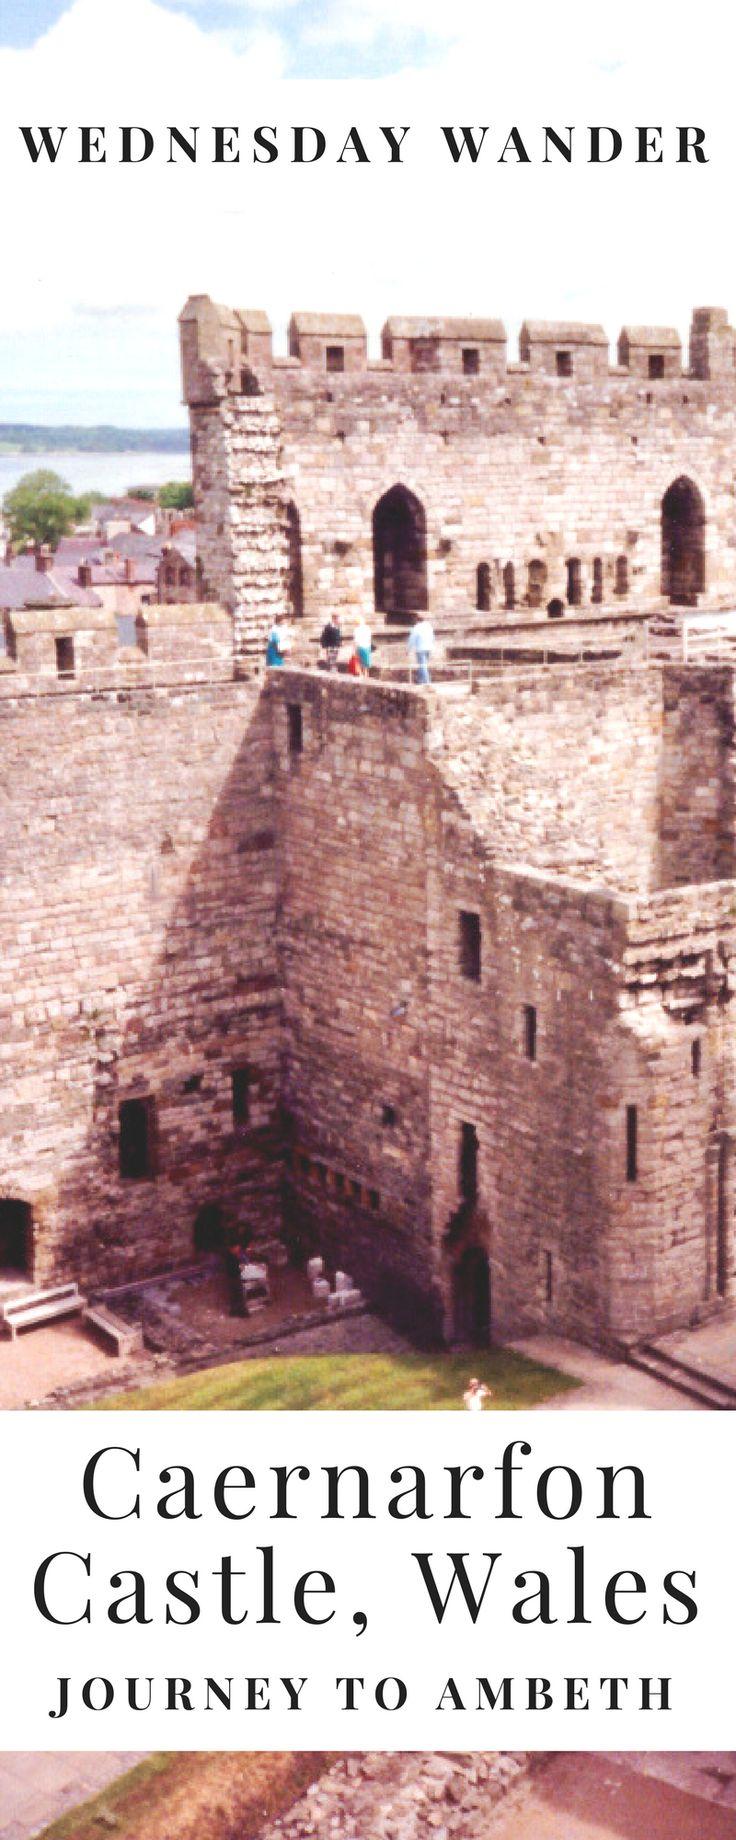 My visit to Caenarfon Castle, Wales #travel #traveldestinations